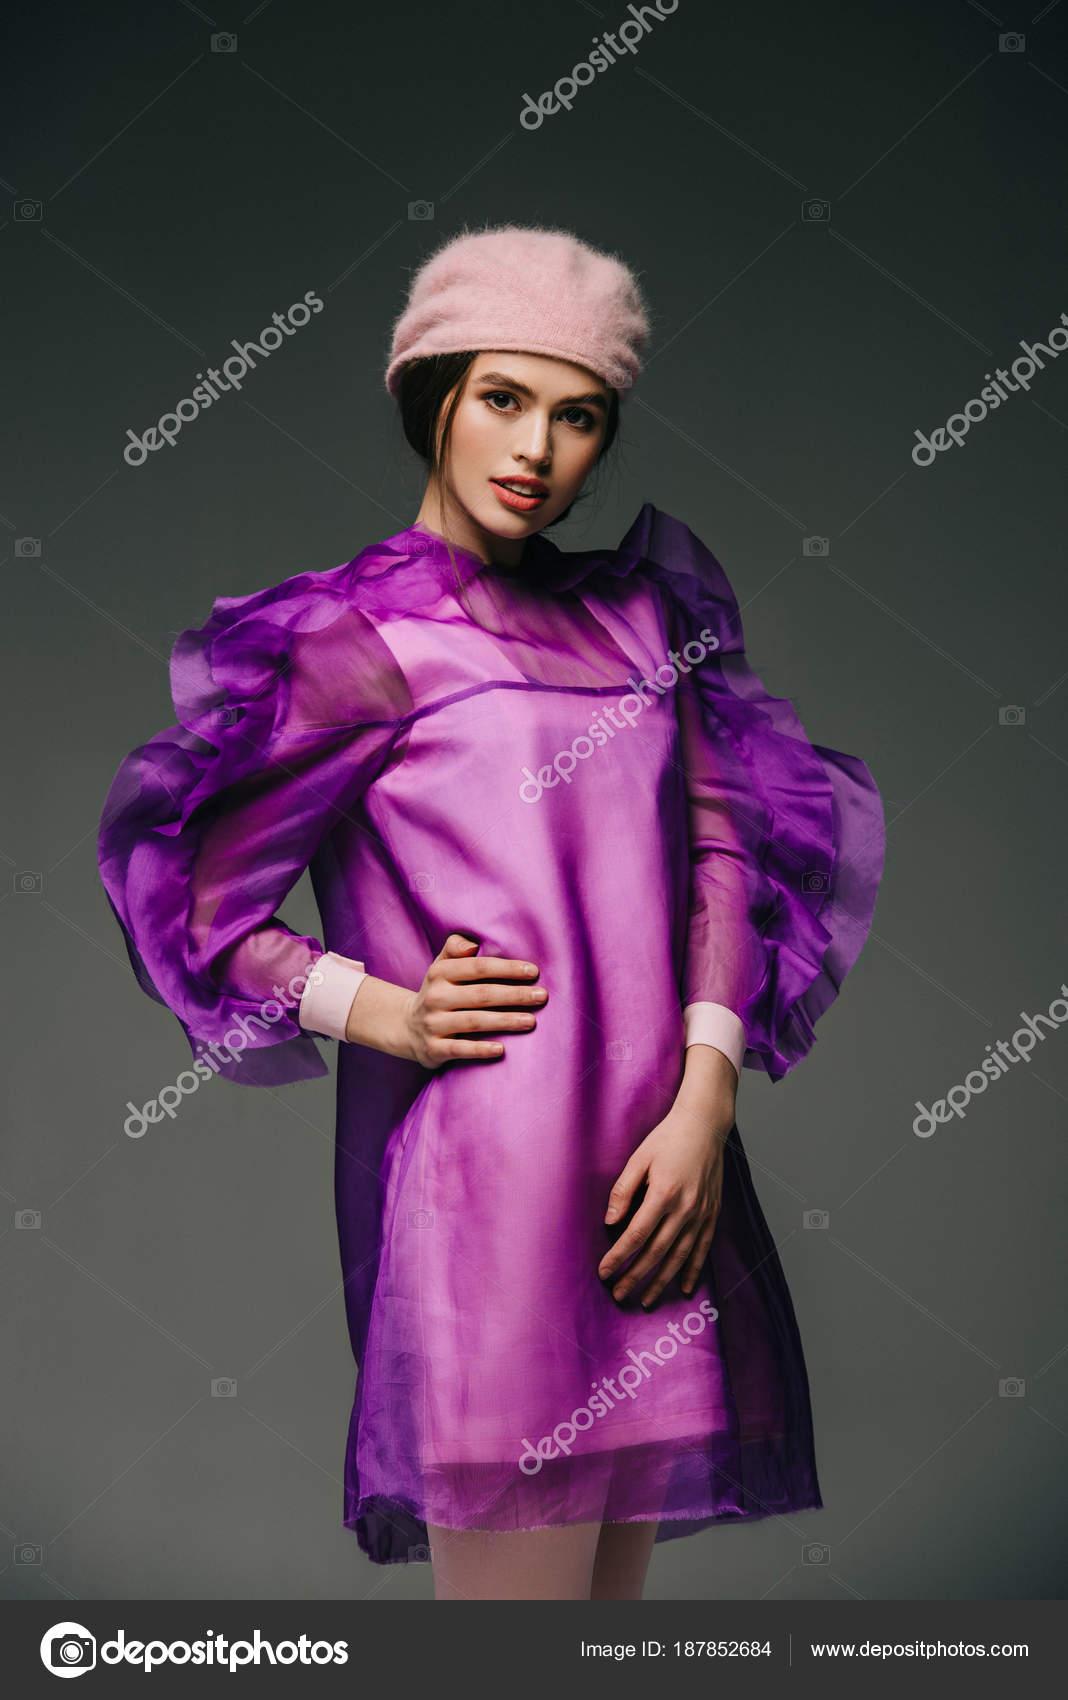 Retrato Mujer Con Estilo Vestido Púrpura Sombrero Posando Sobre ...